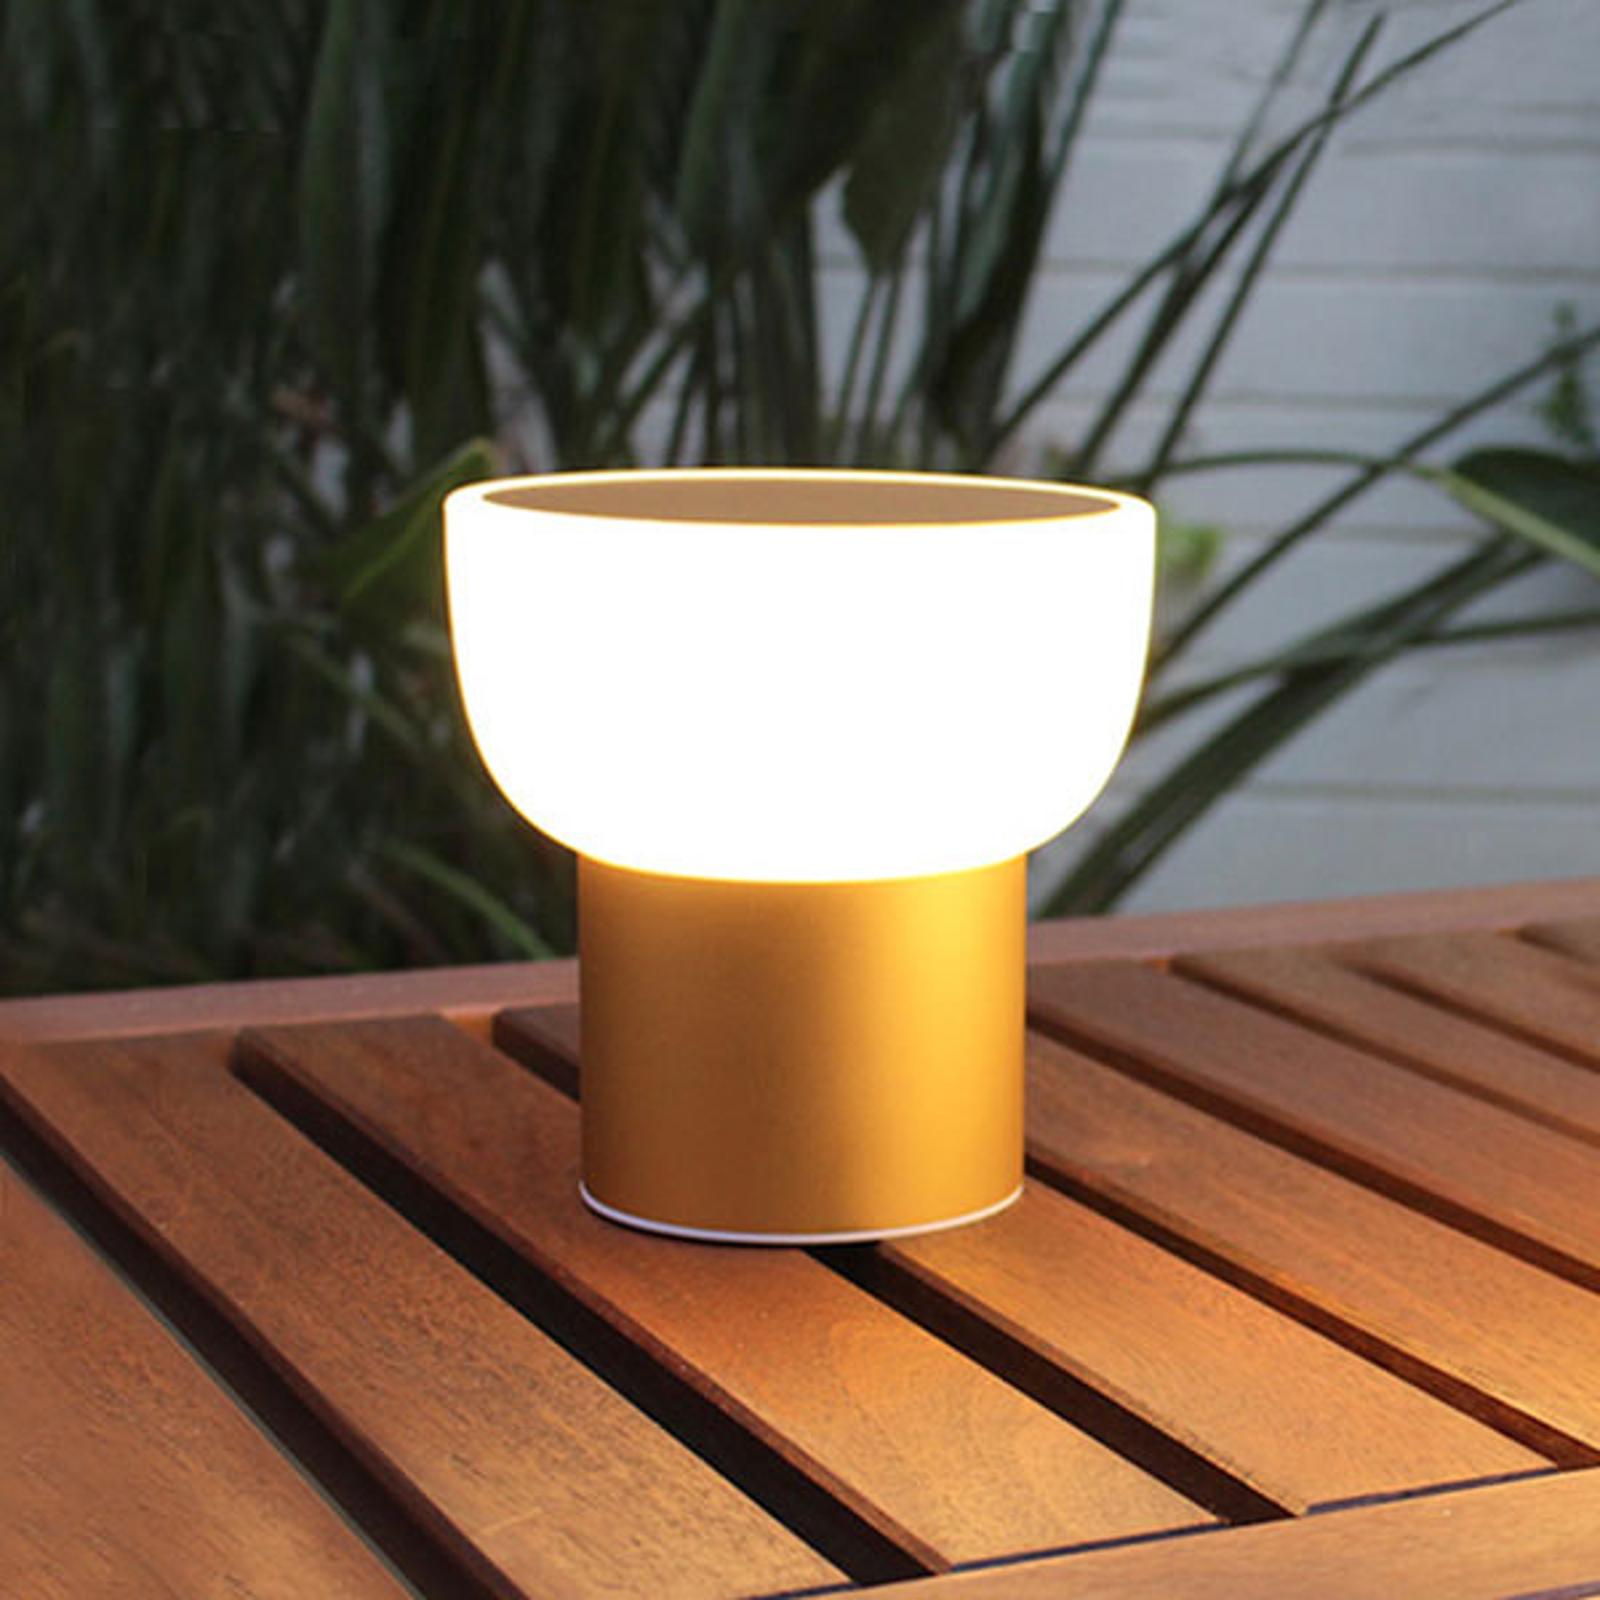 LED-ulkokoristelamppu Patio, kulta, 16 cm, 1, USB